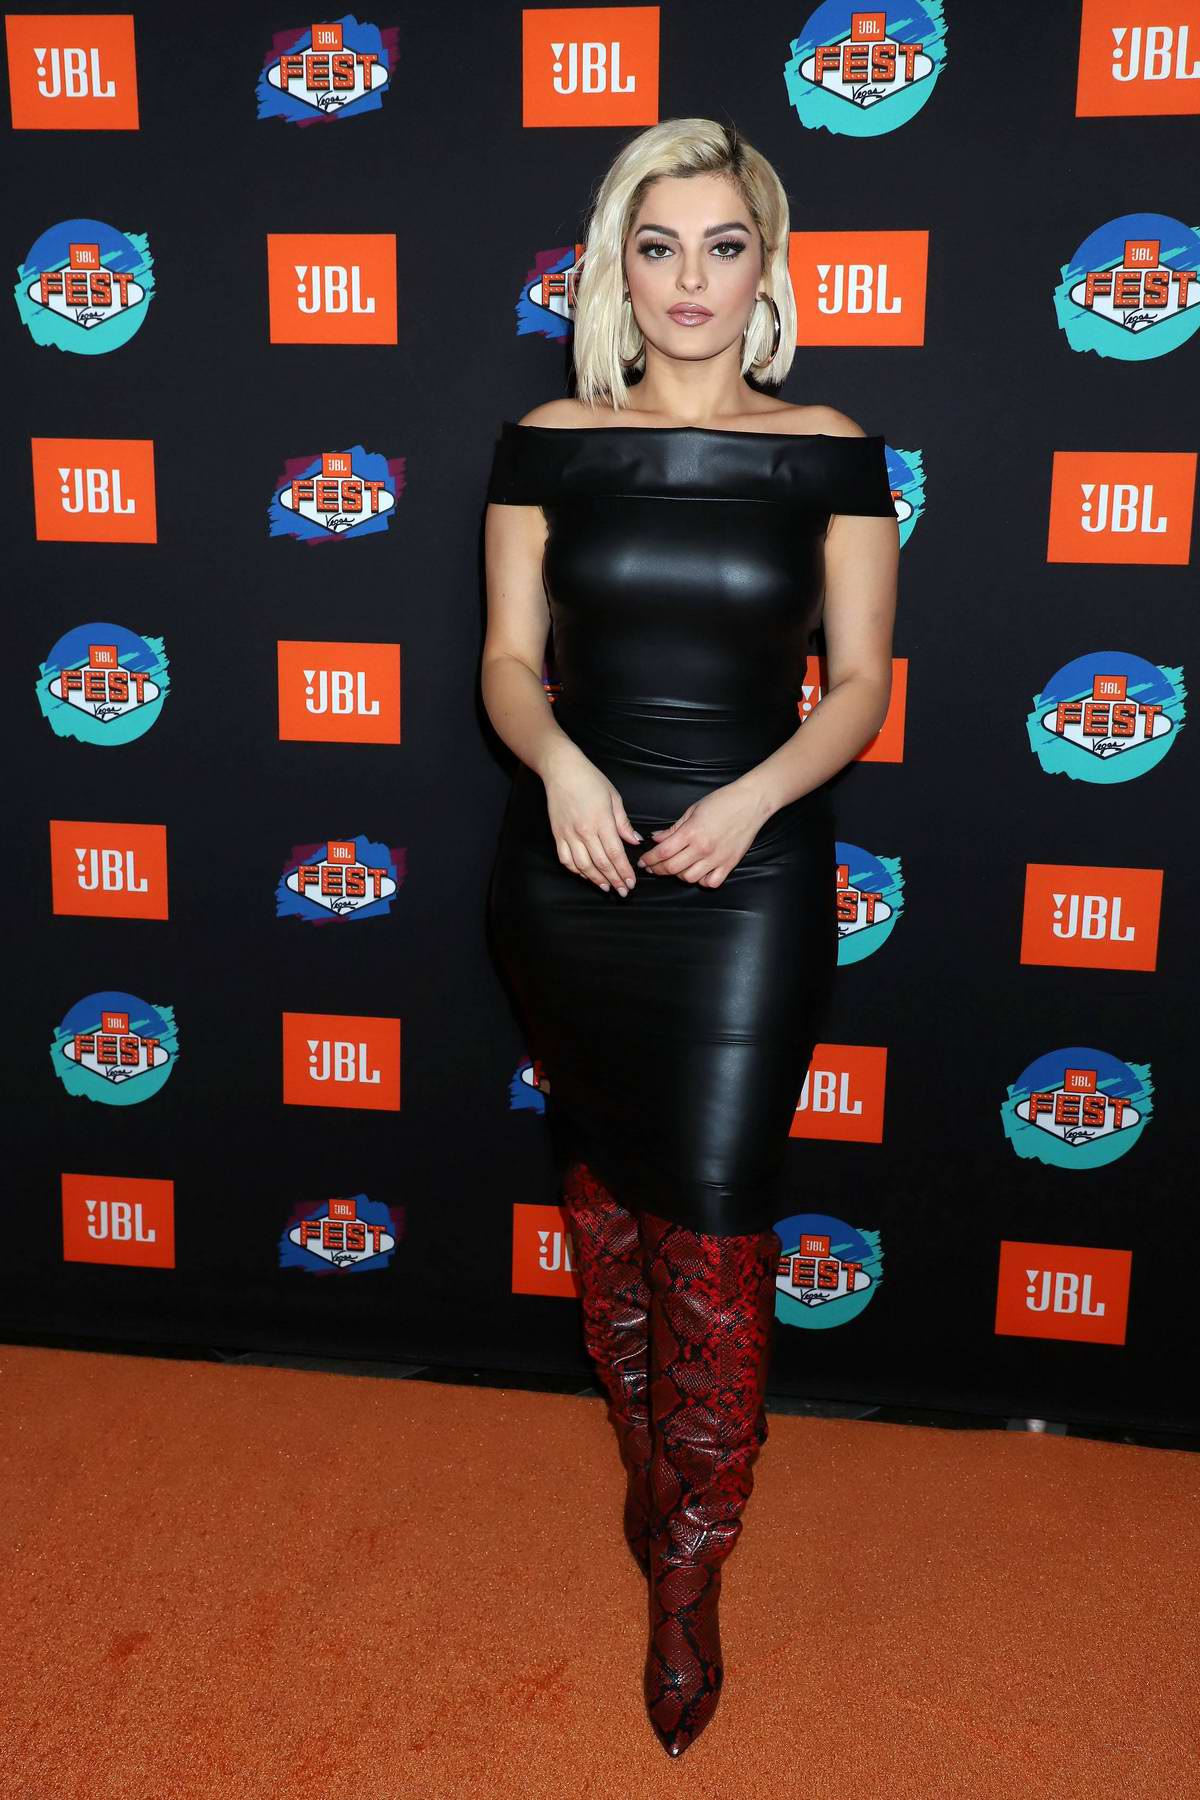 Bebe Rexha attends 3rd Annual JBL Fest 2019 at Jewel Nightclub Aria Resort & Casino in Las Vegas, Nevada